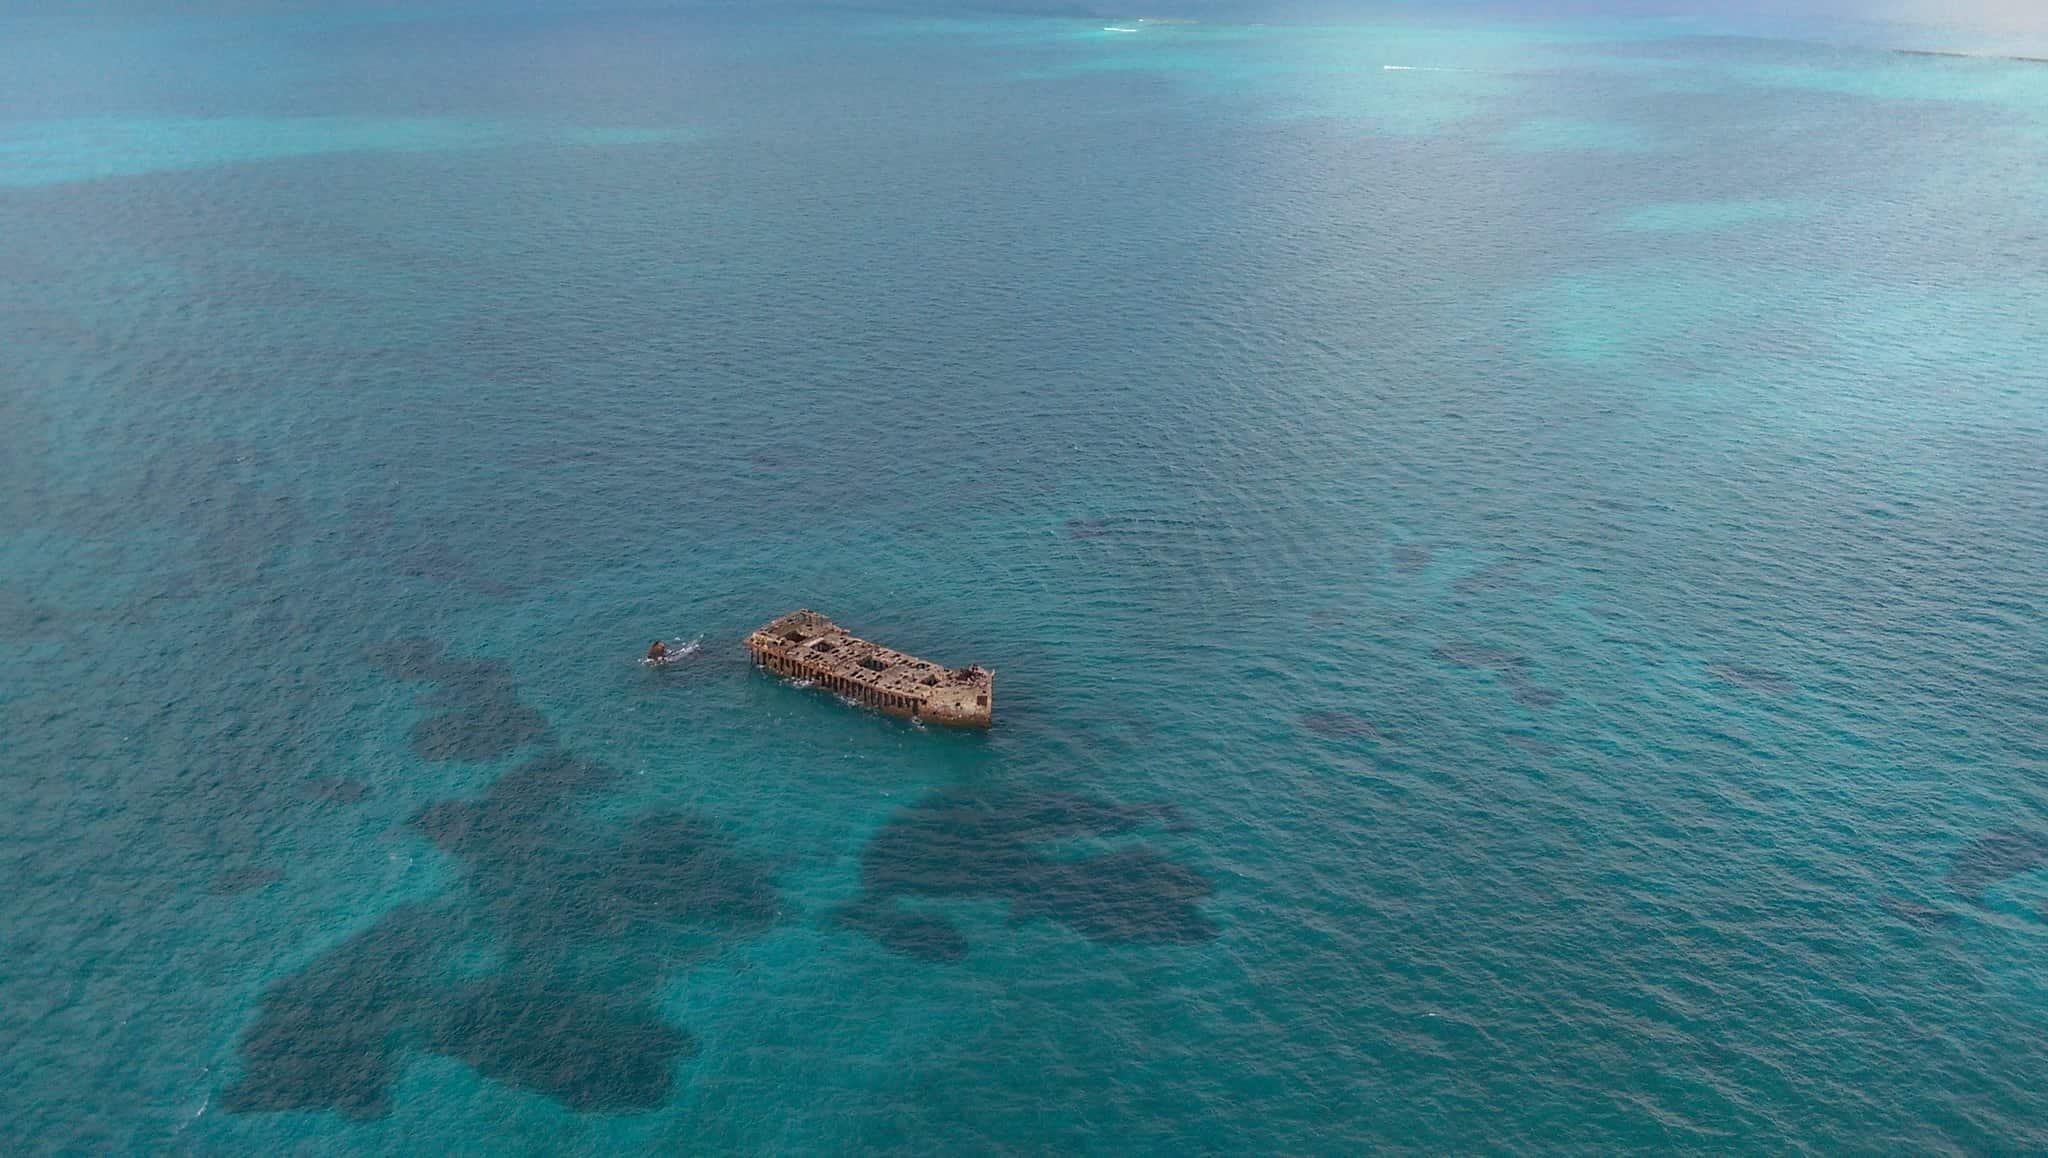 SS Sapona shipwreck bimini bahamas